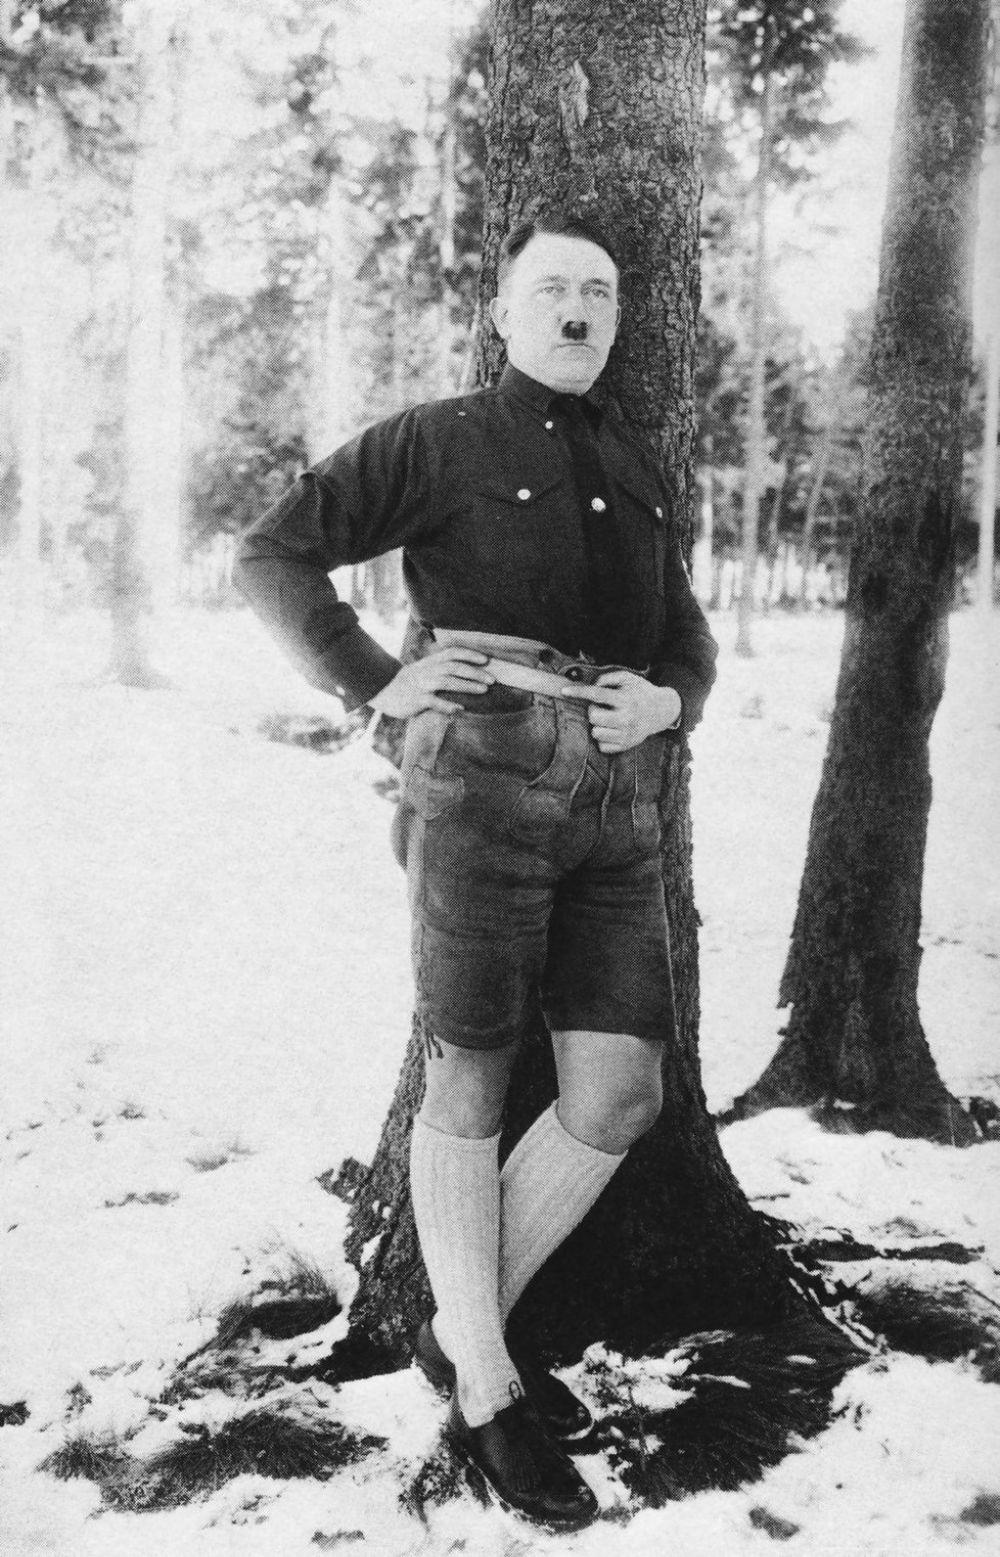 Hilarious Photos of Hitler Wearing Shorts and KneeHigh